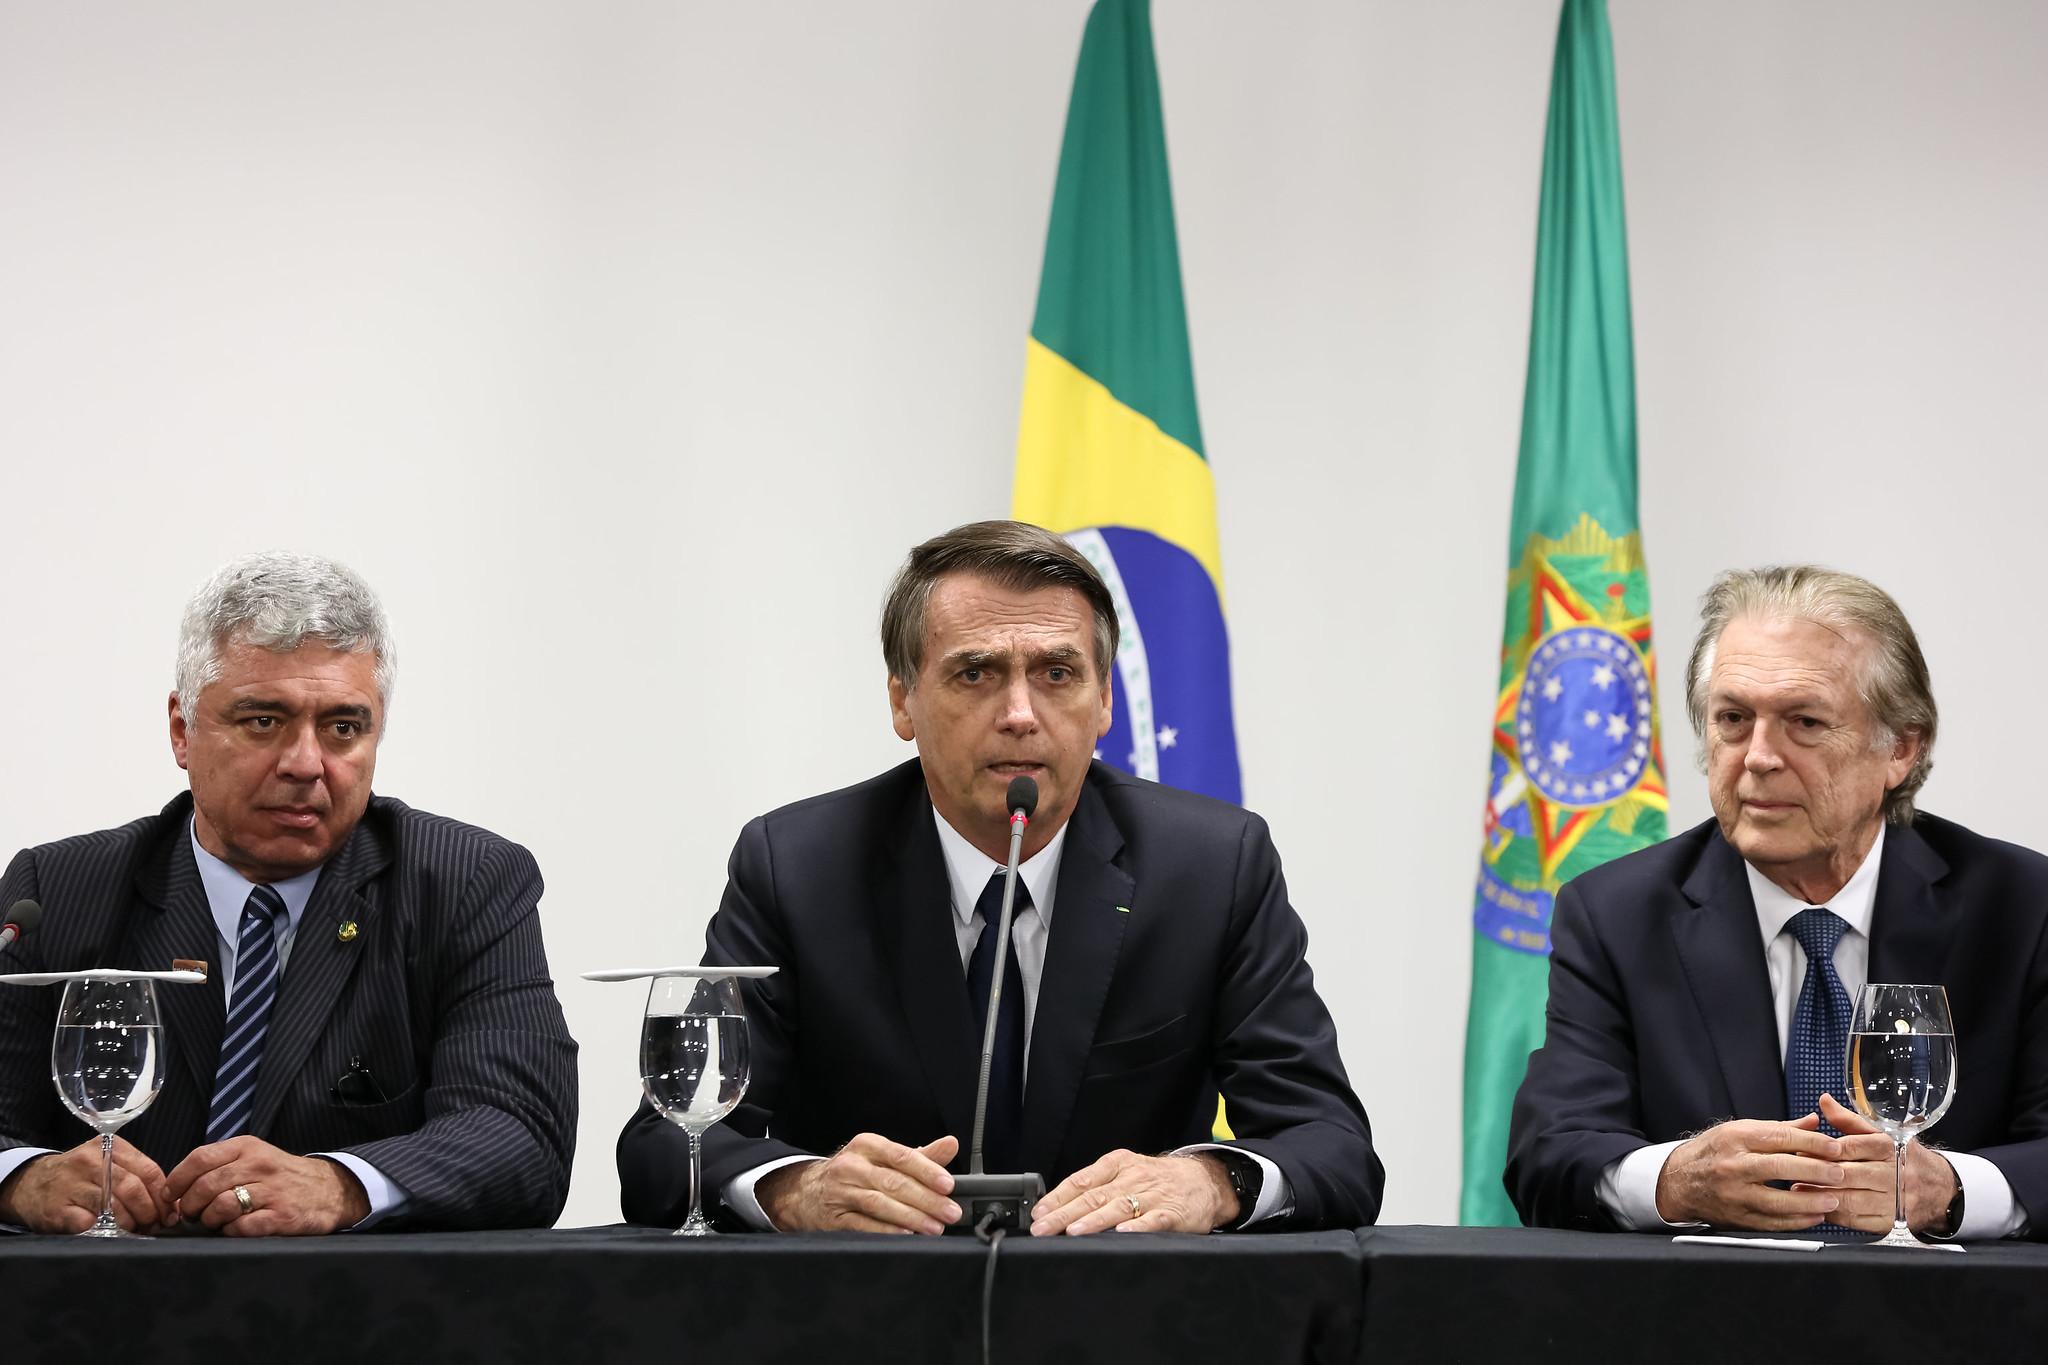 Major Olímpico, Jair Bolsonaro e Luciano Bivar